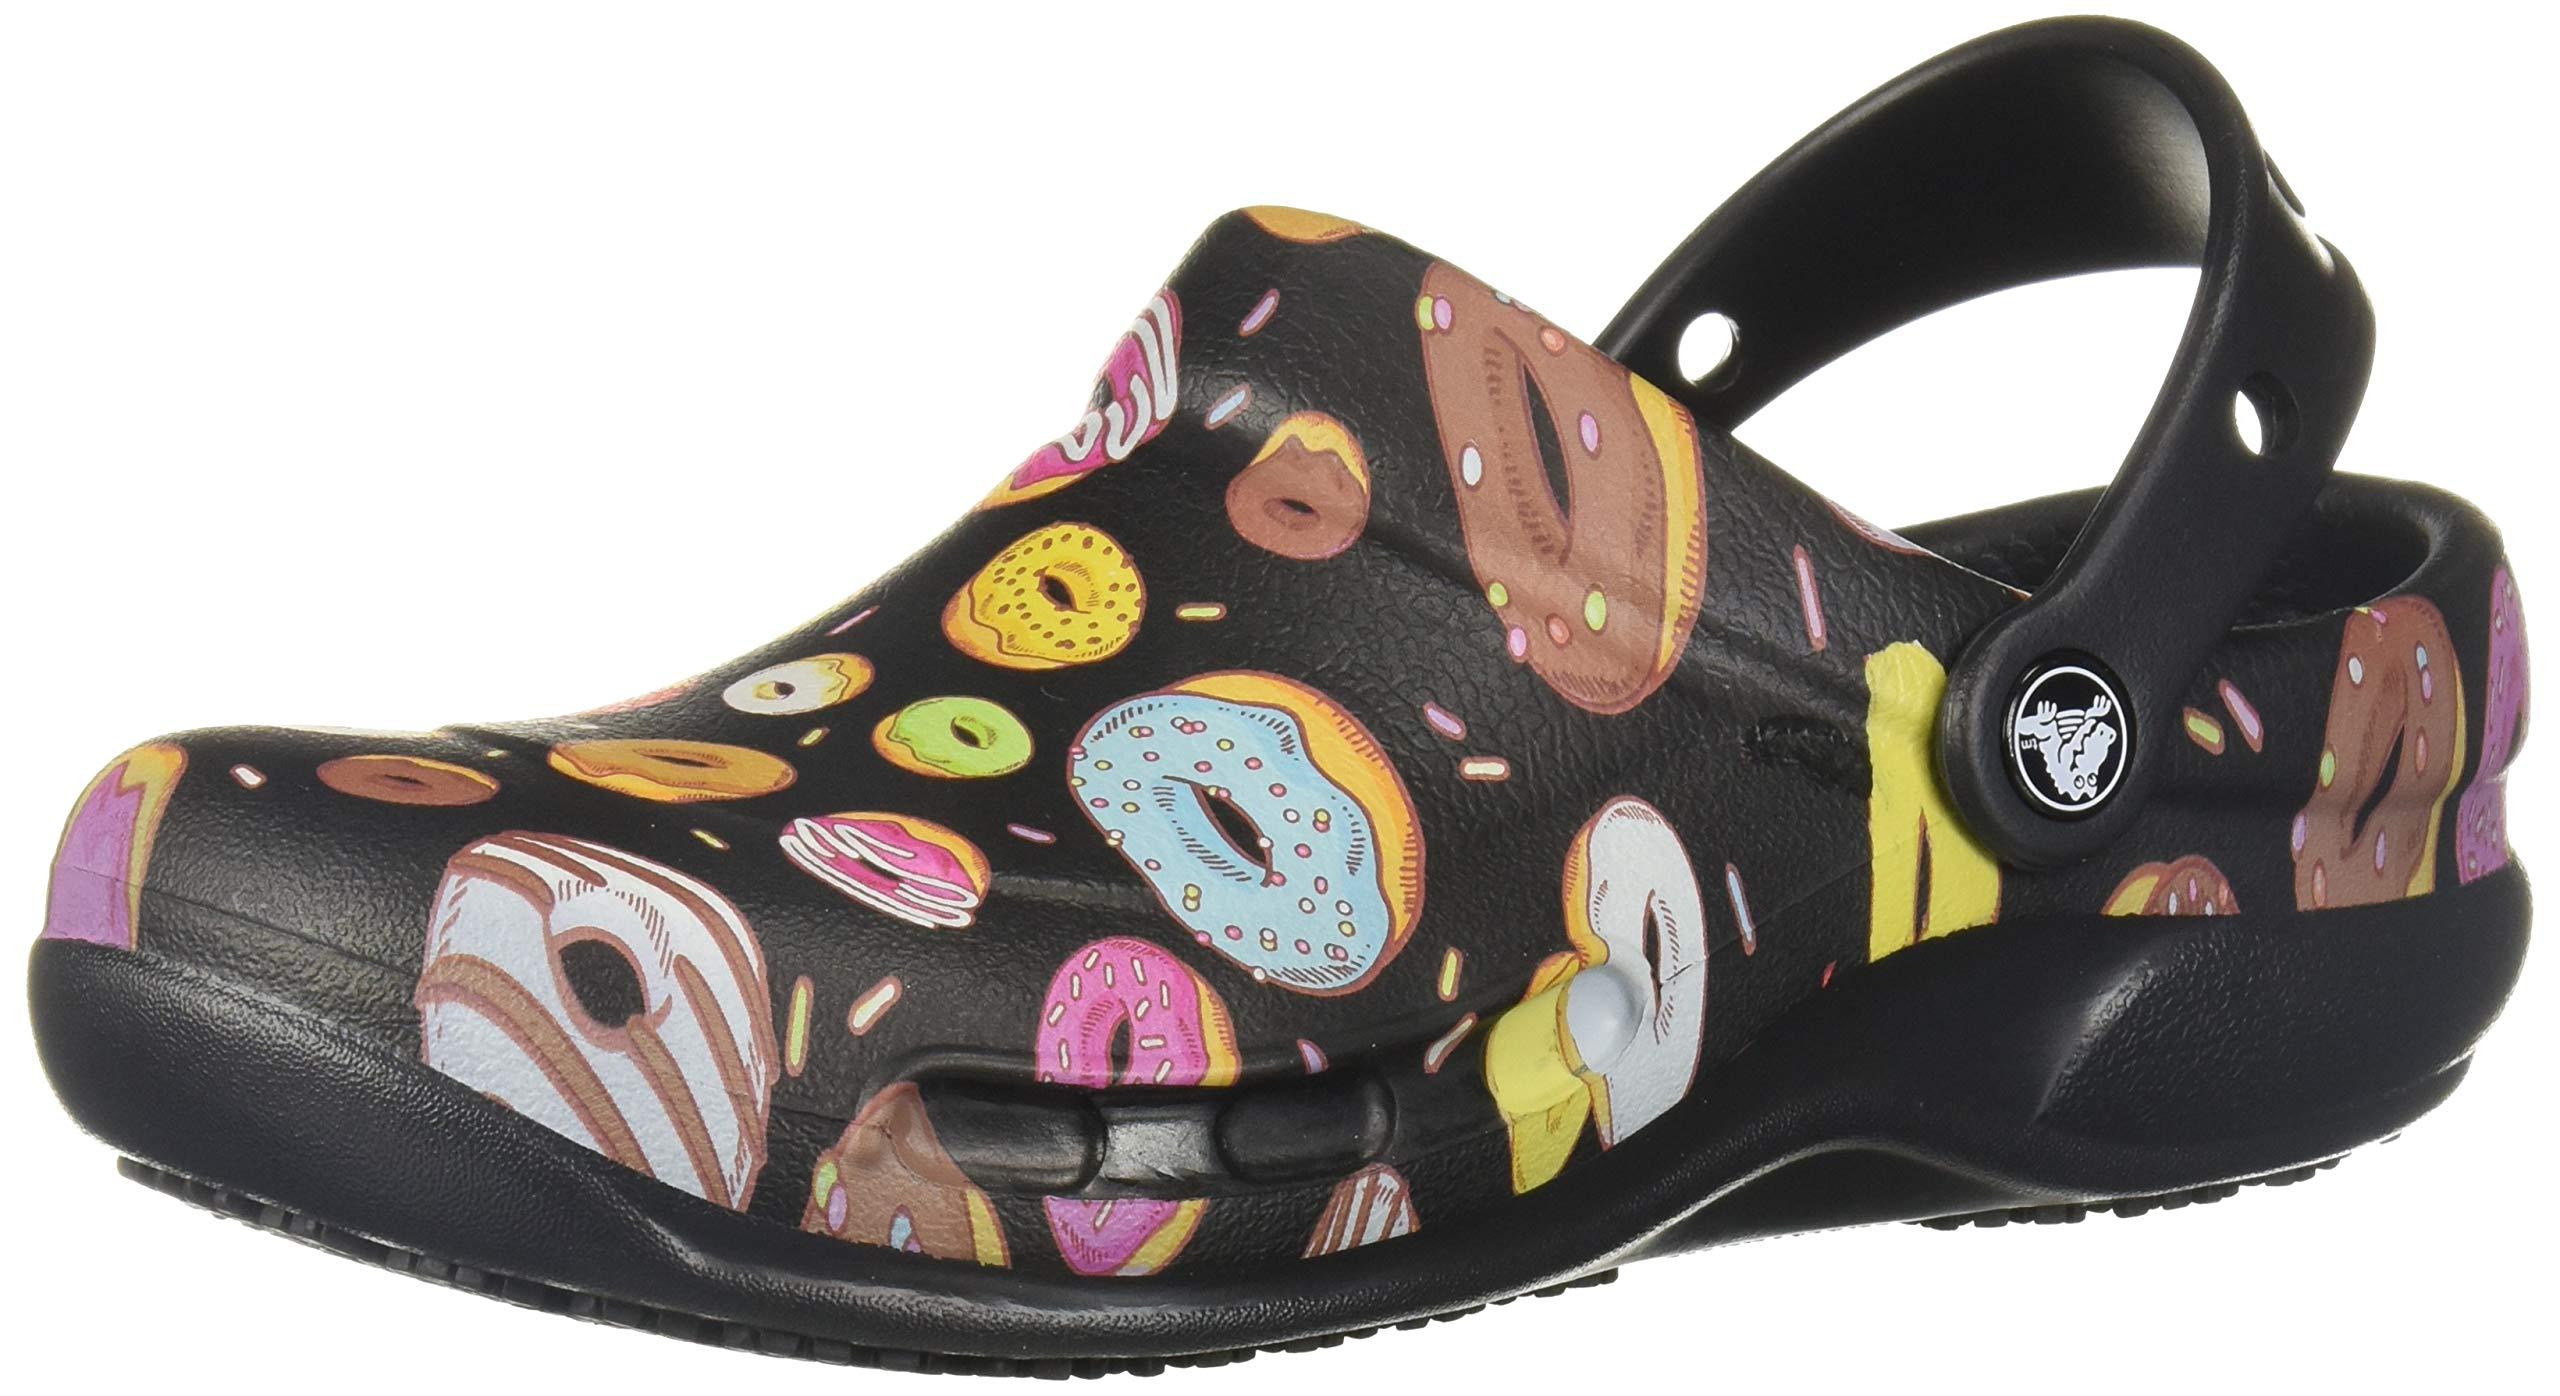 Crocs Unisex-Adult Bistro Graphic Clog